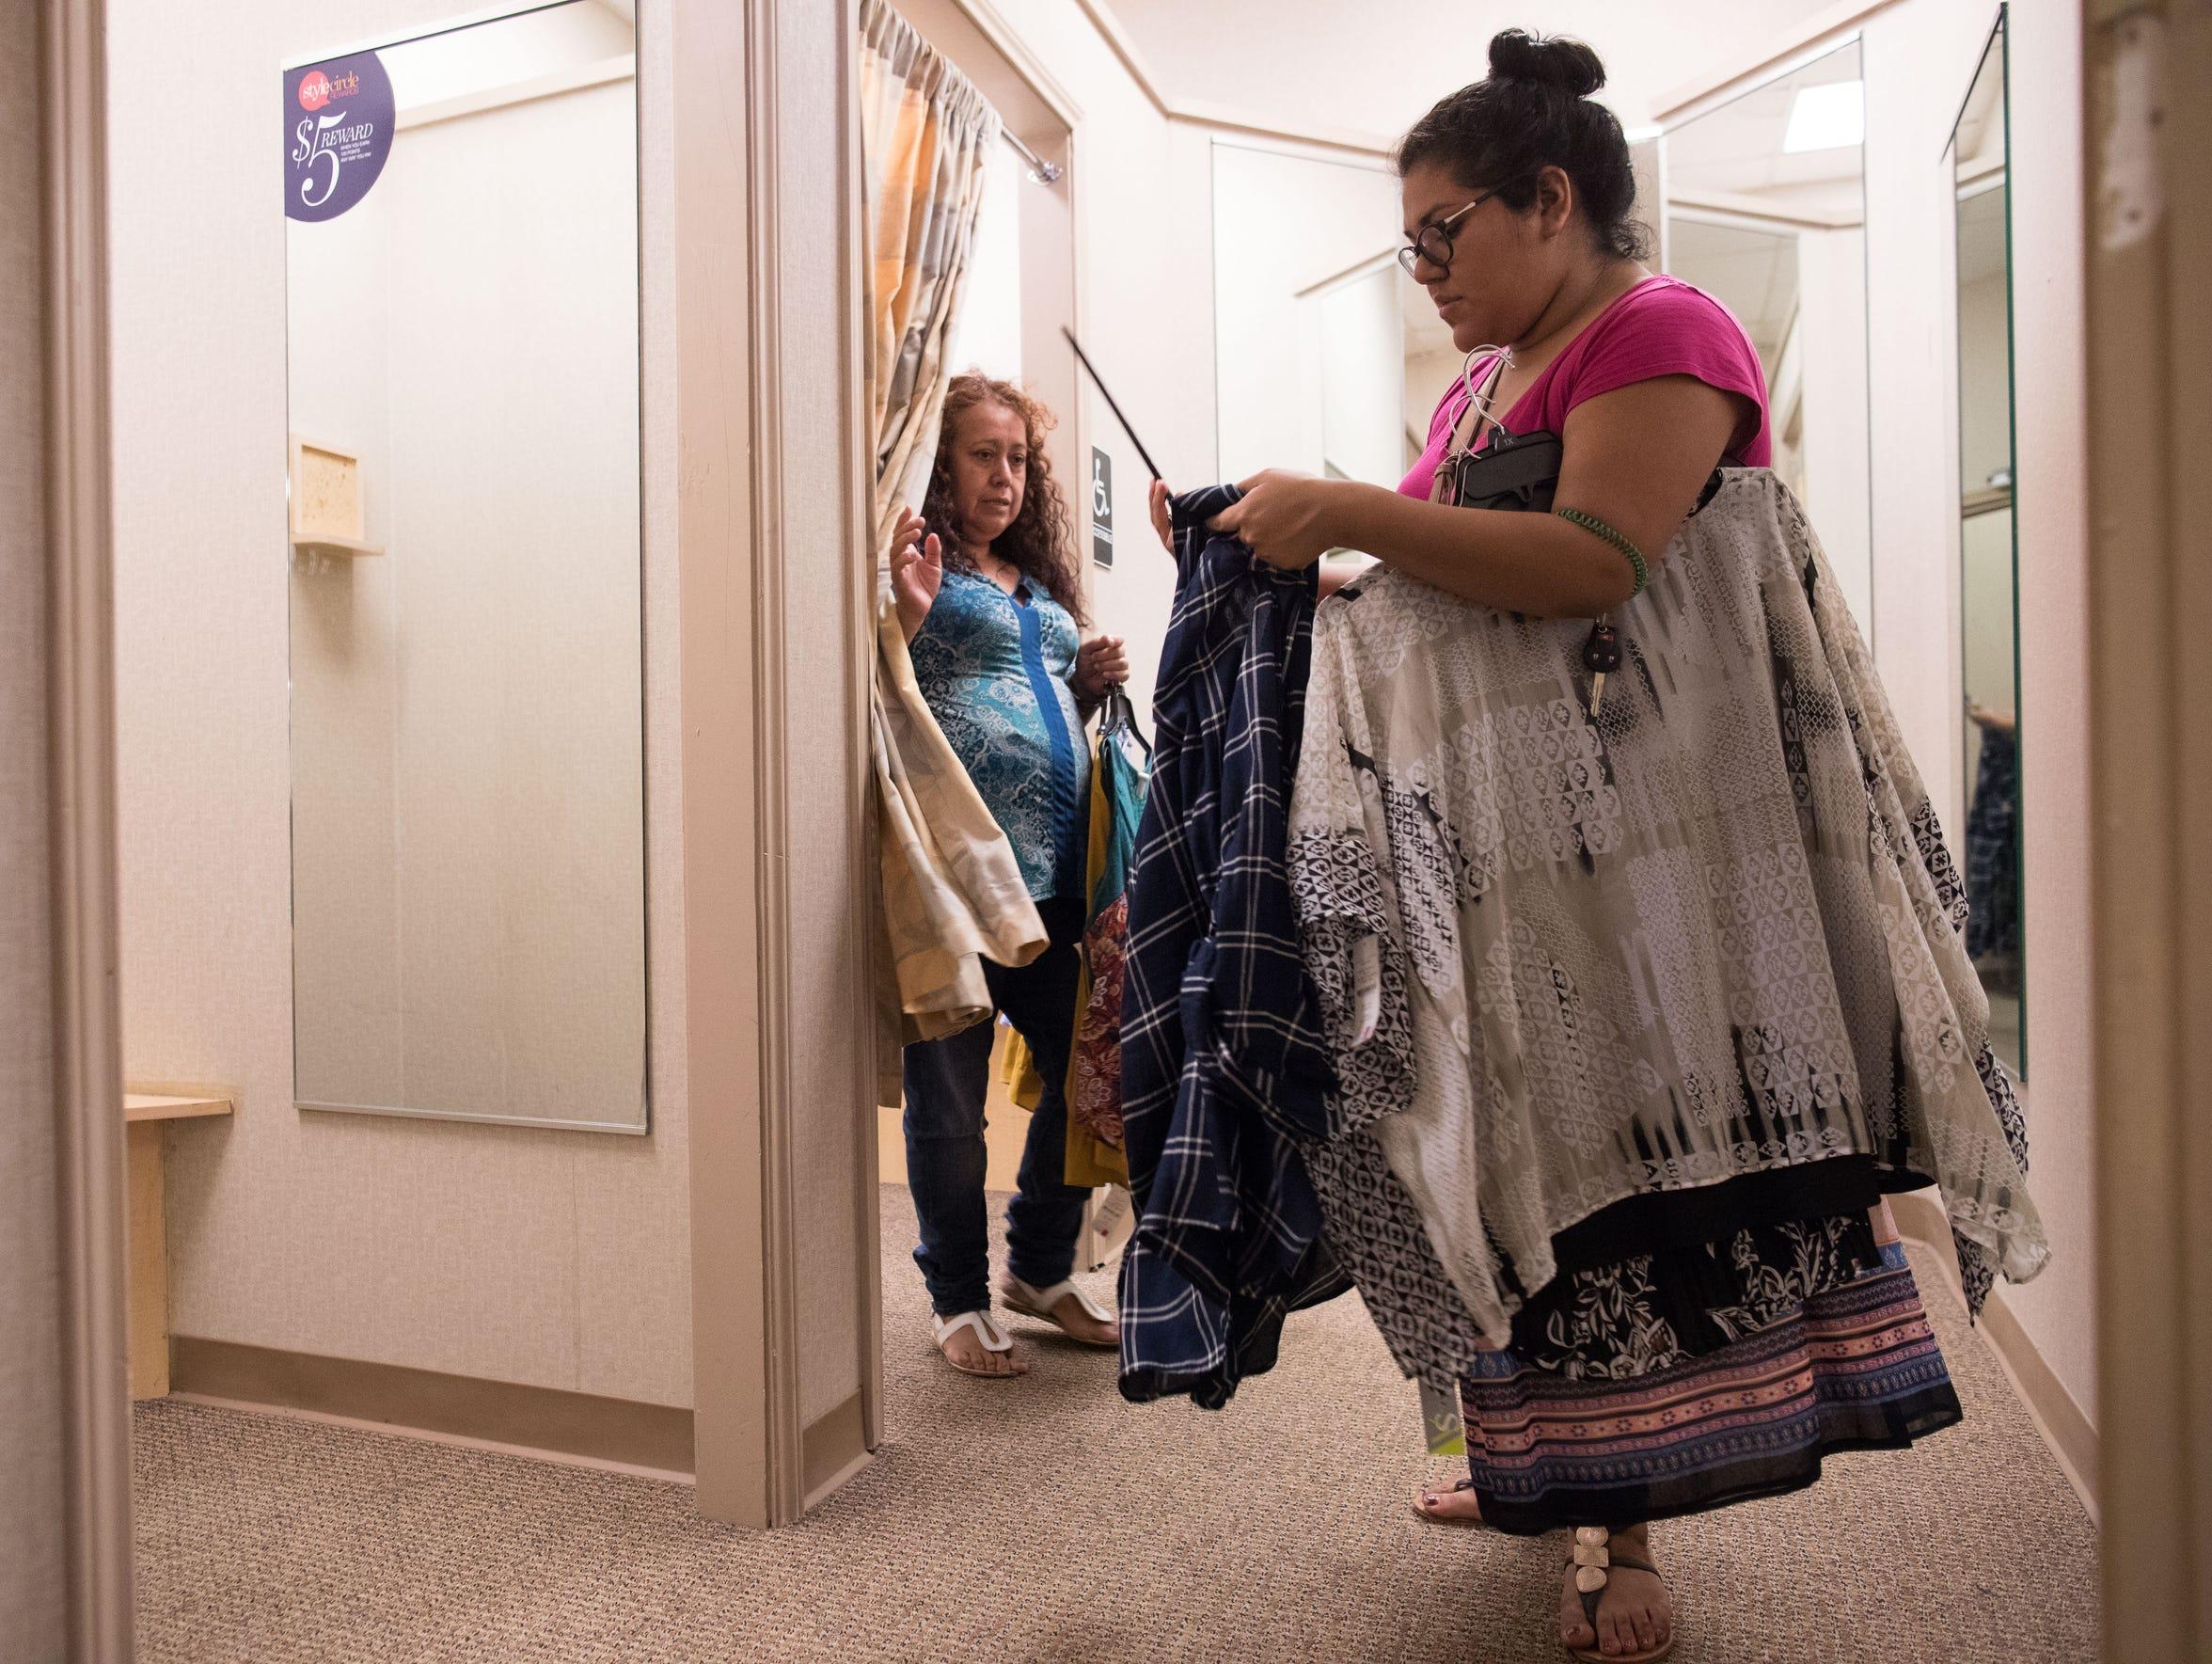 Maria Hernandez helps her mother Carlota Palomo pick